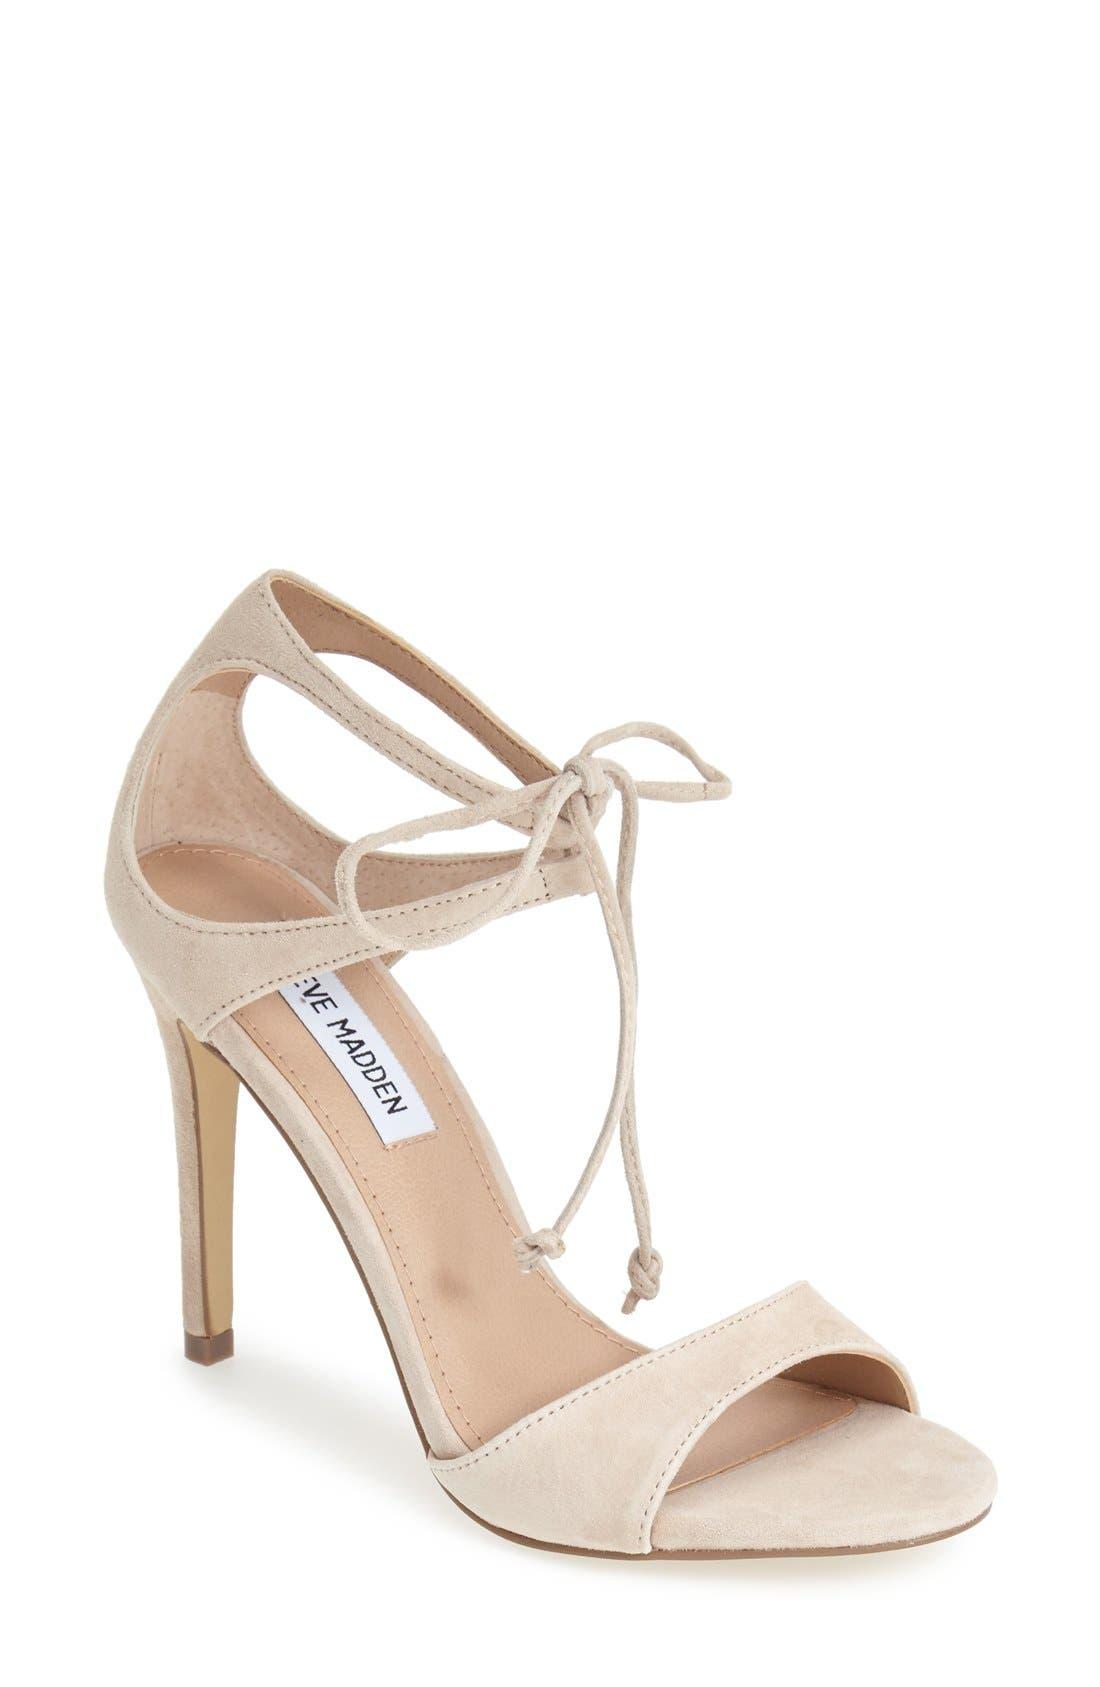 Main Image - Steve Madden 'Semona' Suede Ankle Strap Sandal (Women)